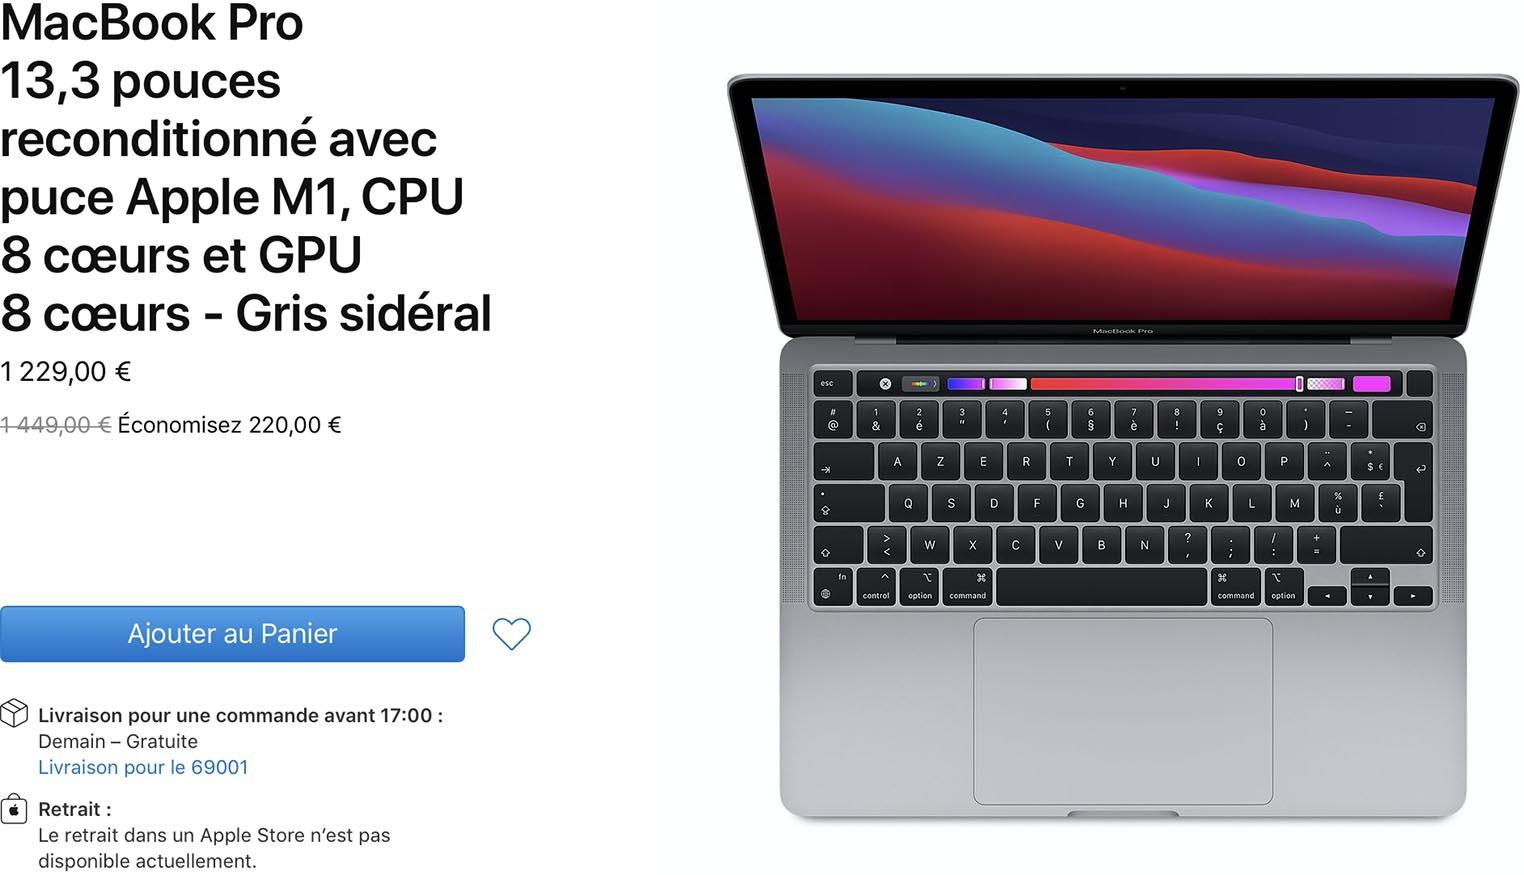 MacBook Pro M1 Refurb Store